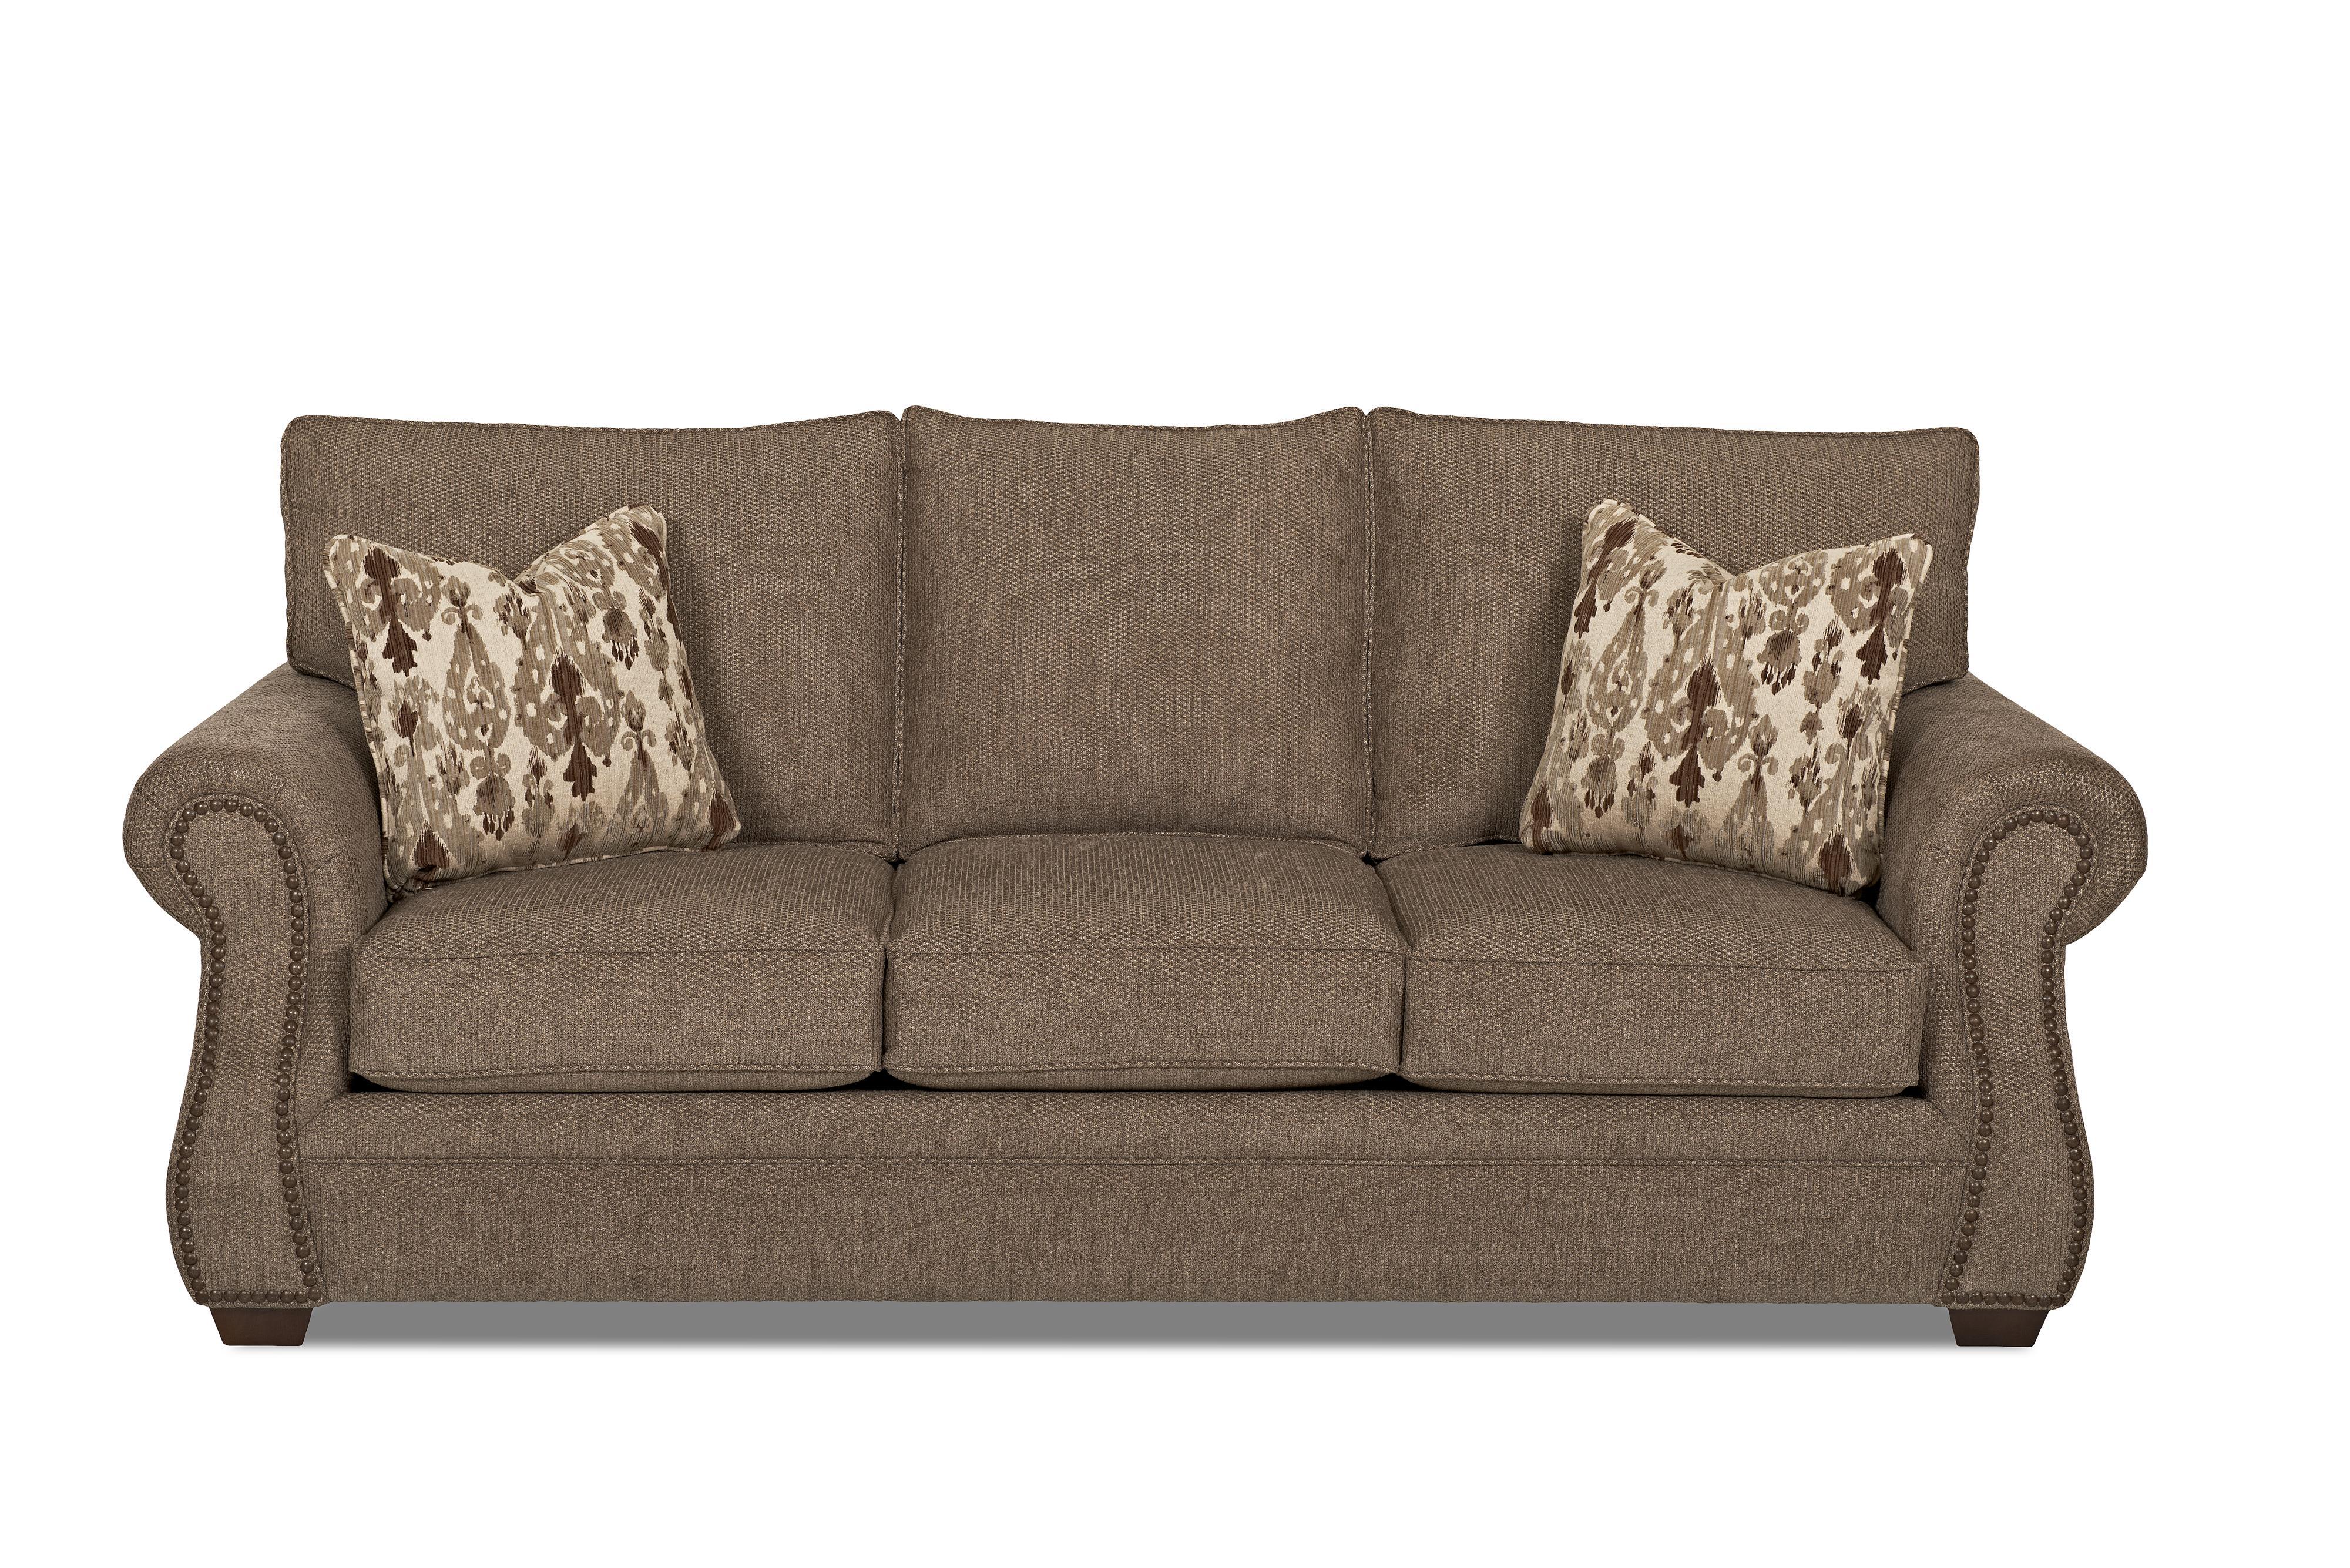 Klaussner jasper traditional air coil mattress sleeper for Klaussner sofa